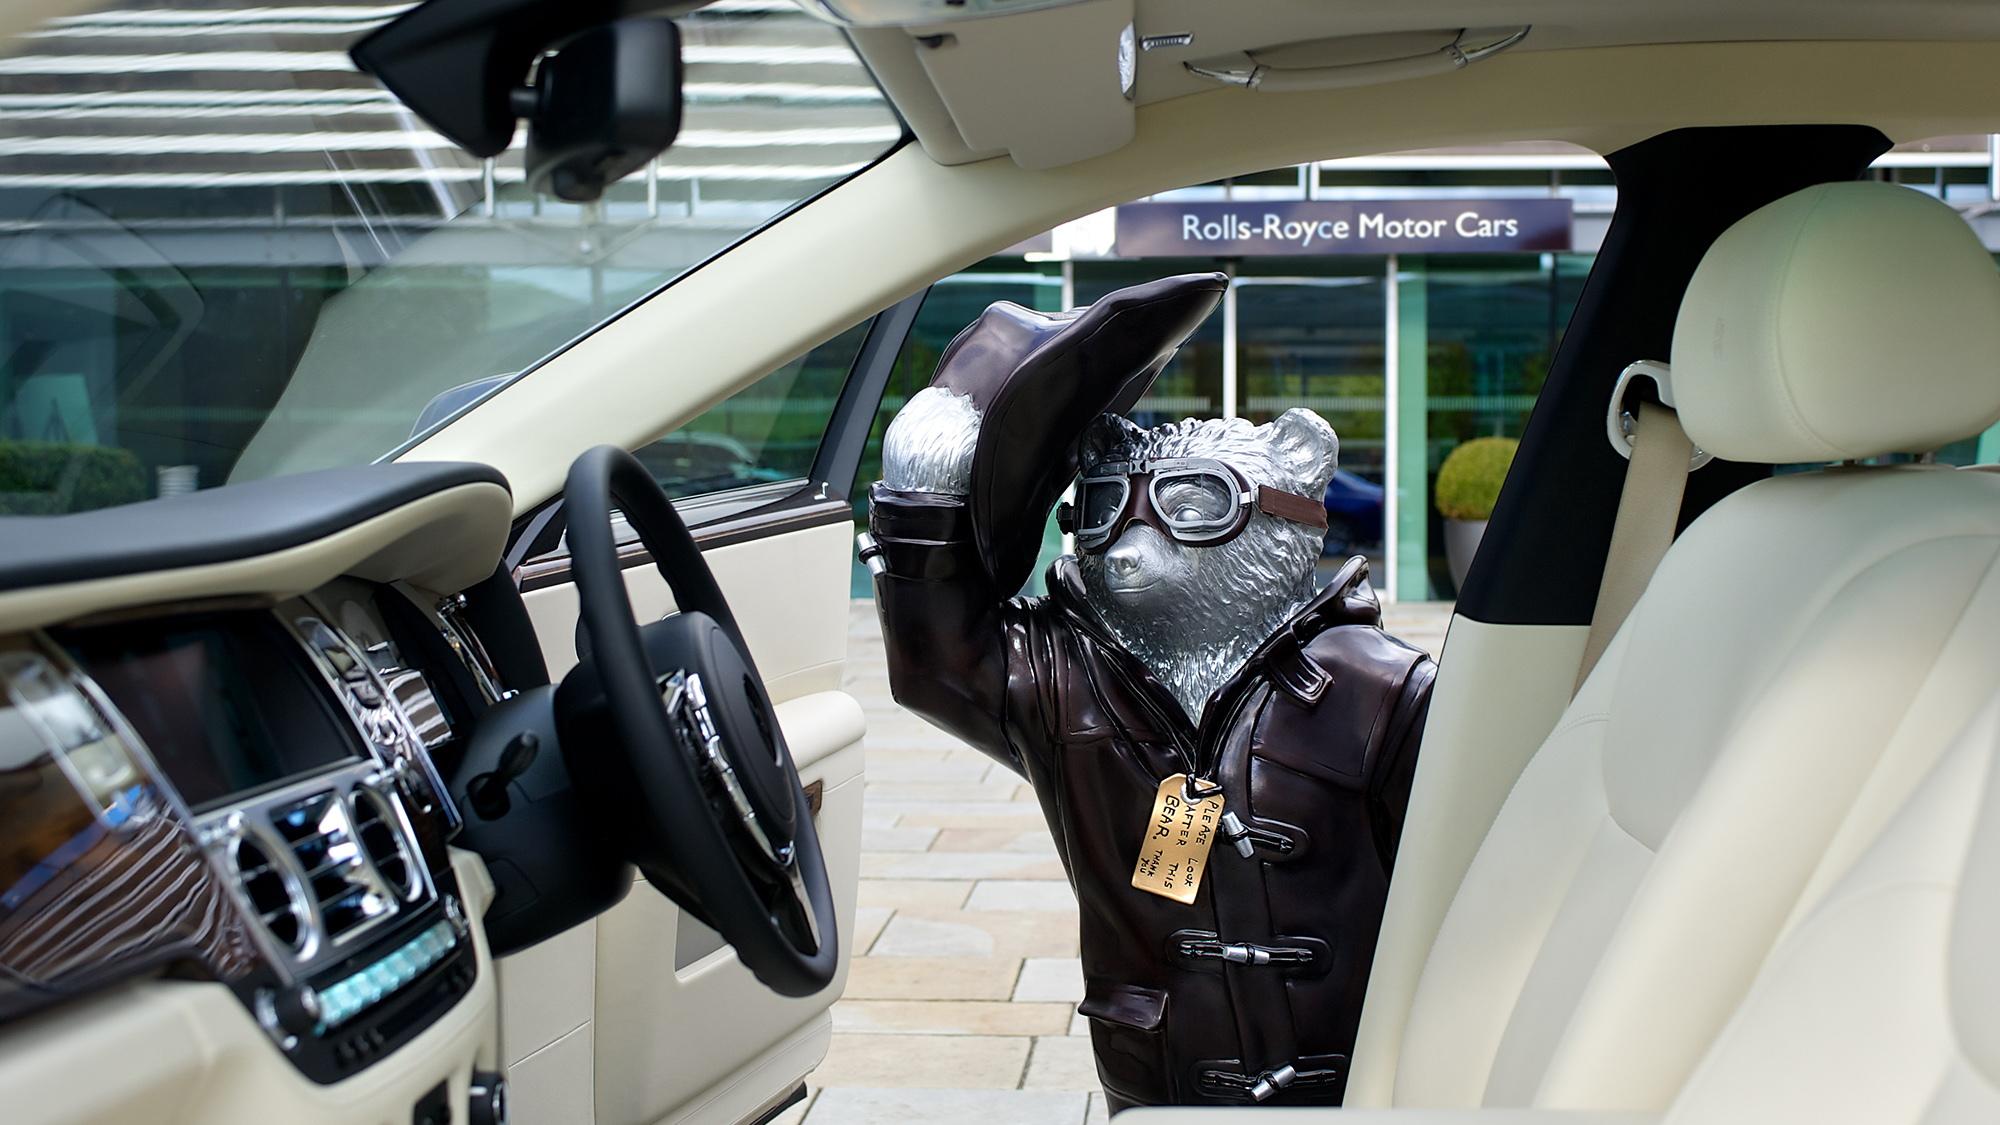 Rolls-Royce Paddington